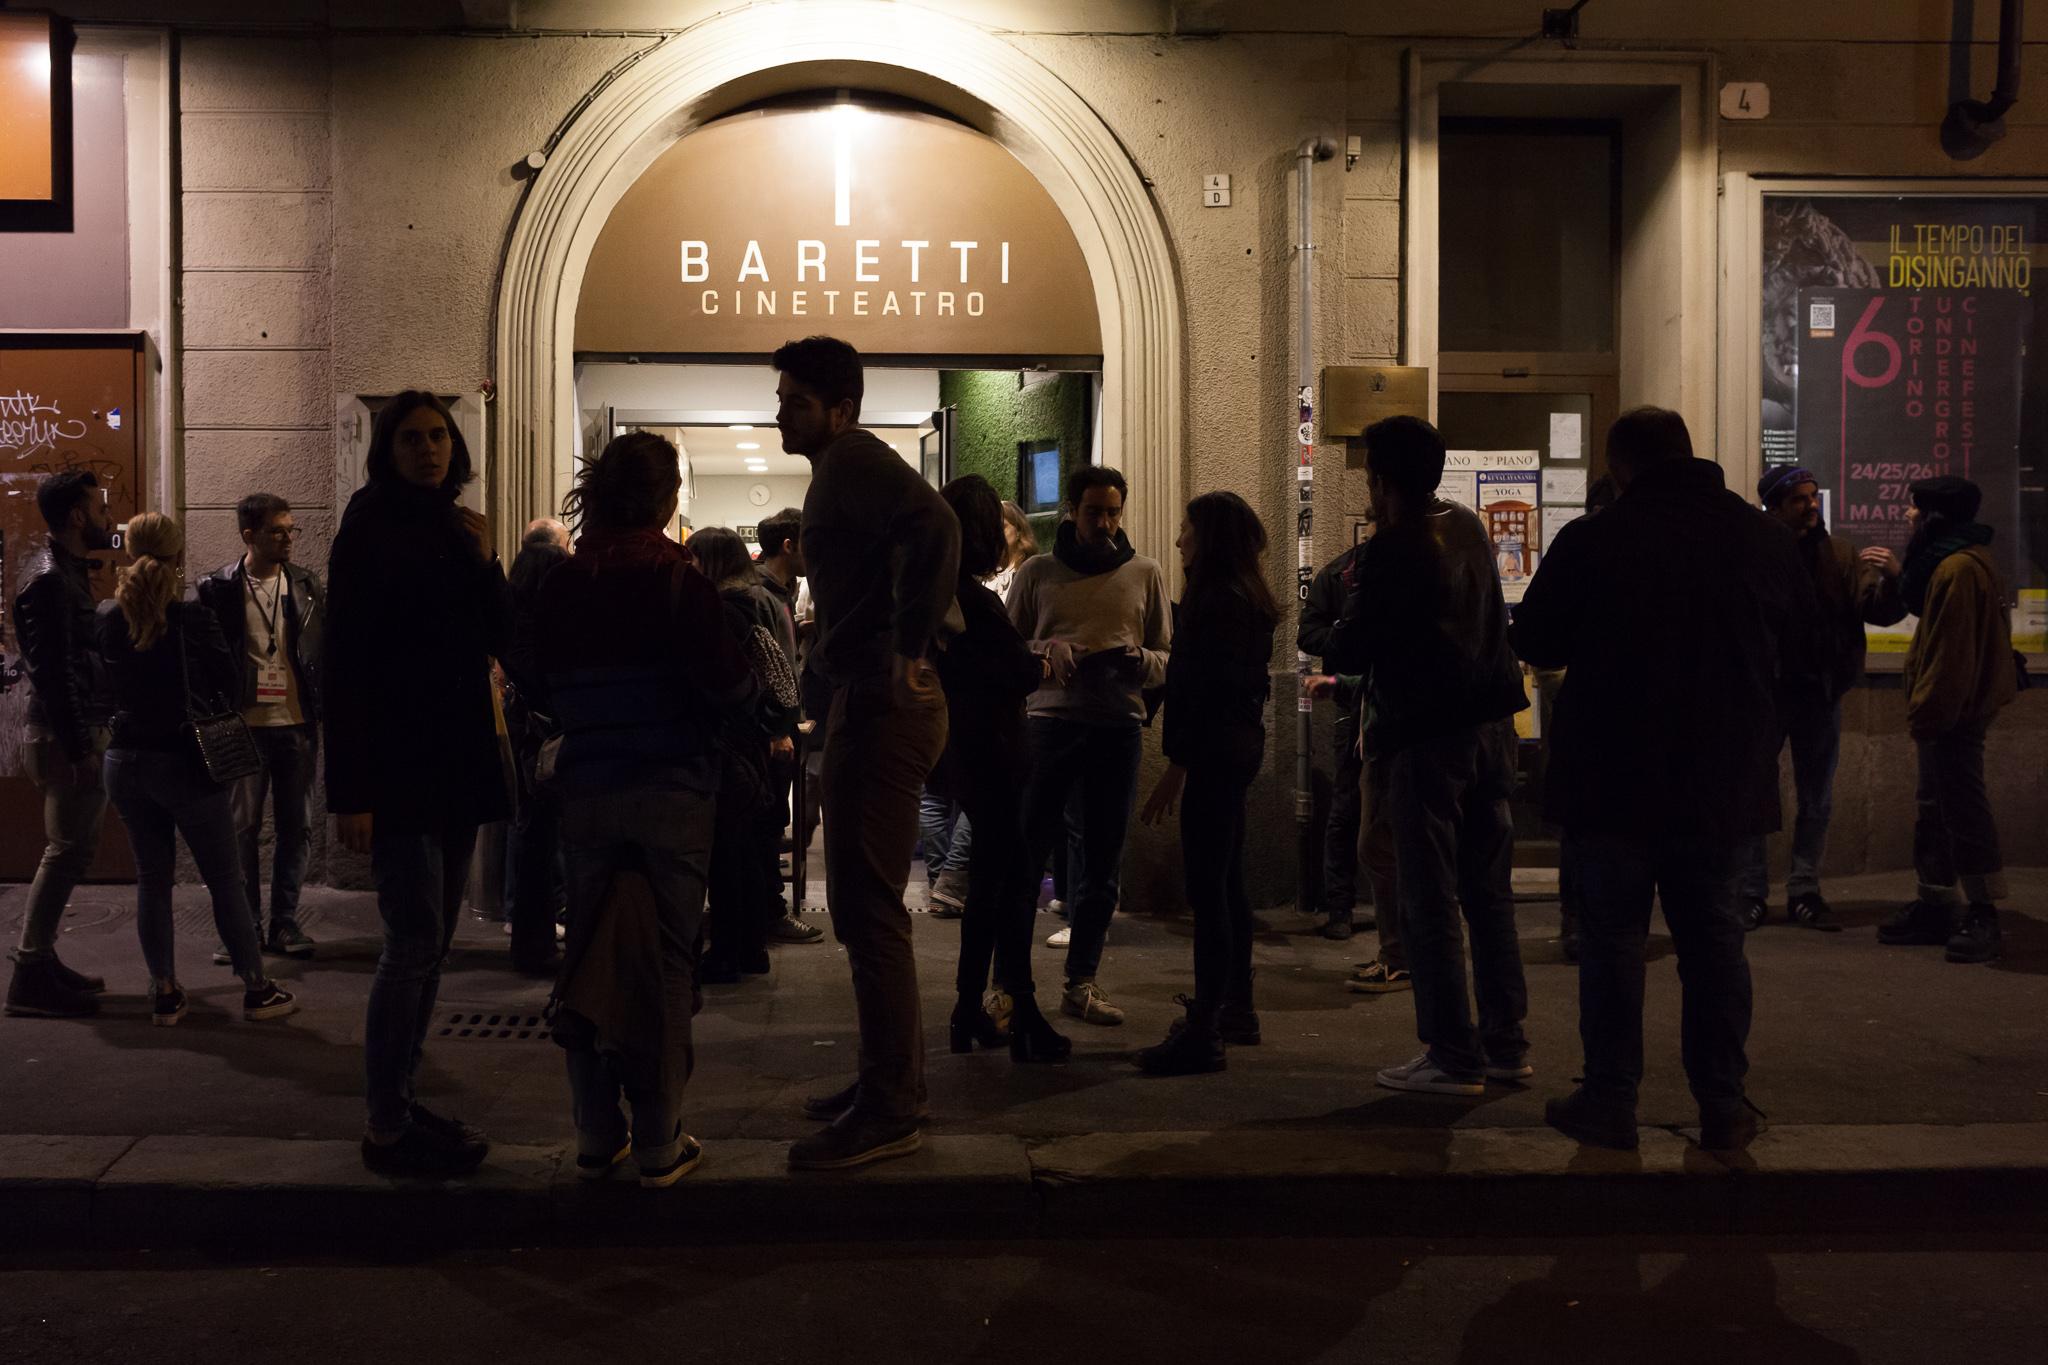 TUC_Baretti_Generale_25-03-5